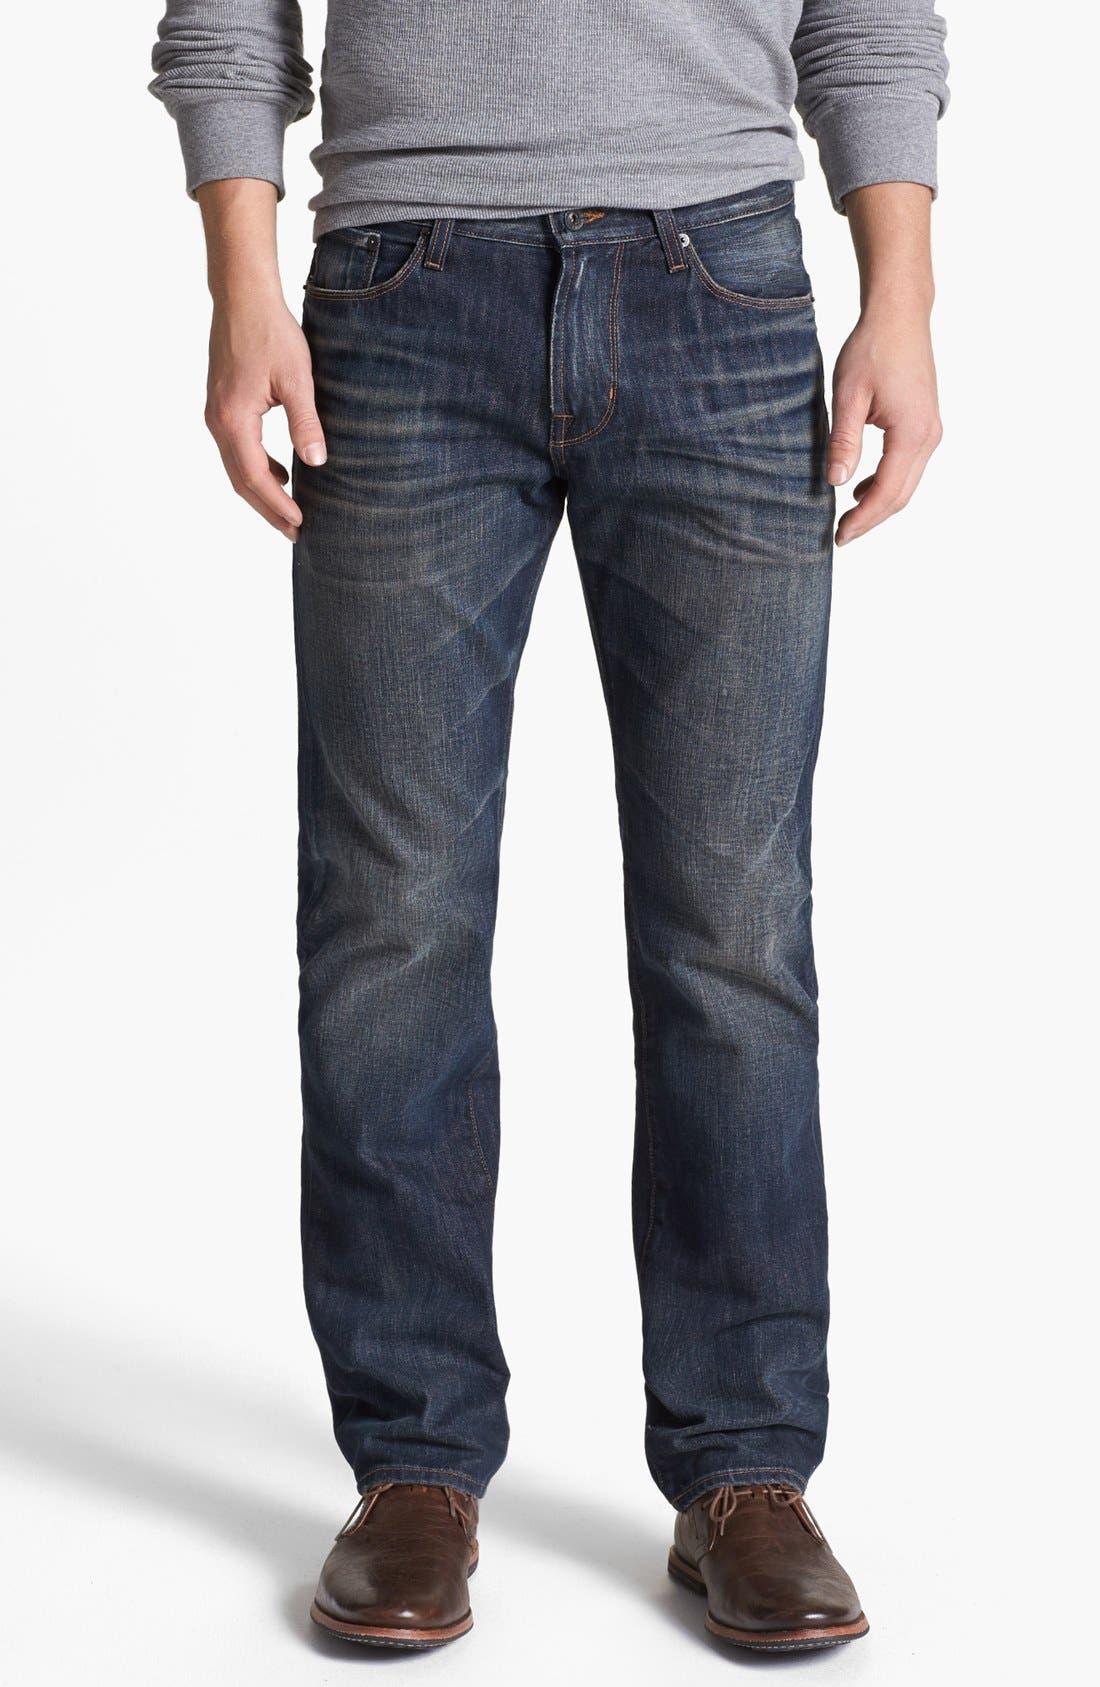 Main Image - Big Star 'Division' Straight Leg Jeans (6 Year Piston)